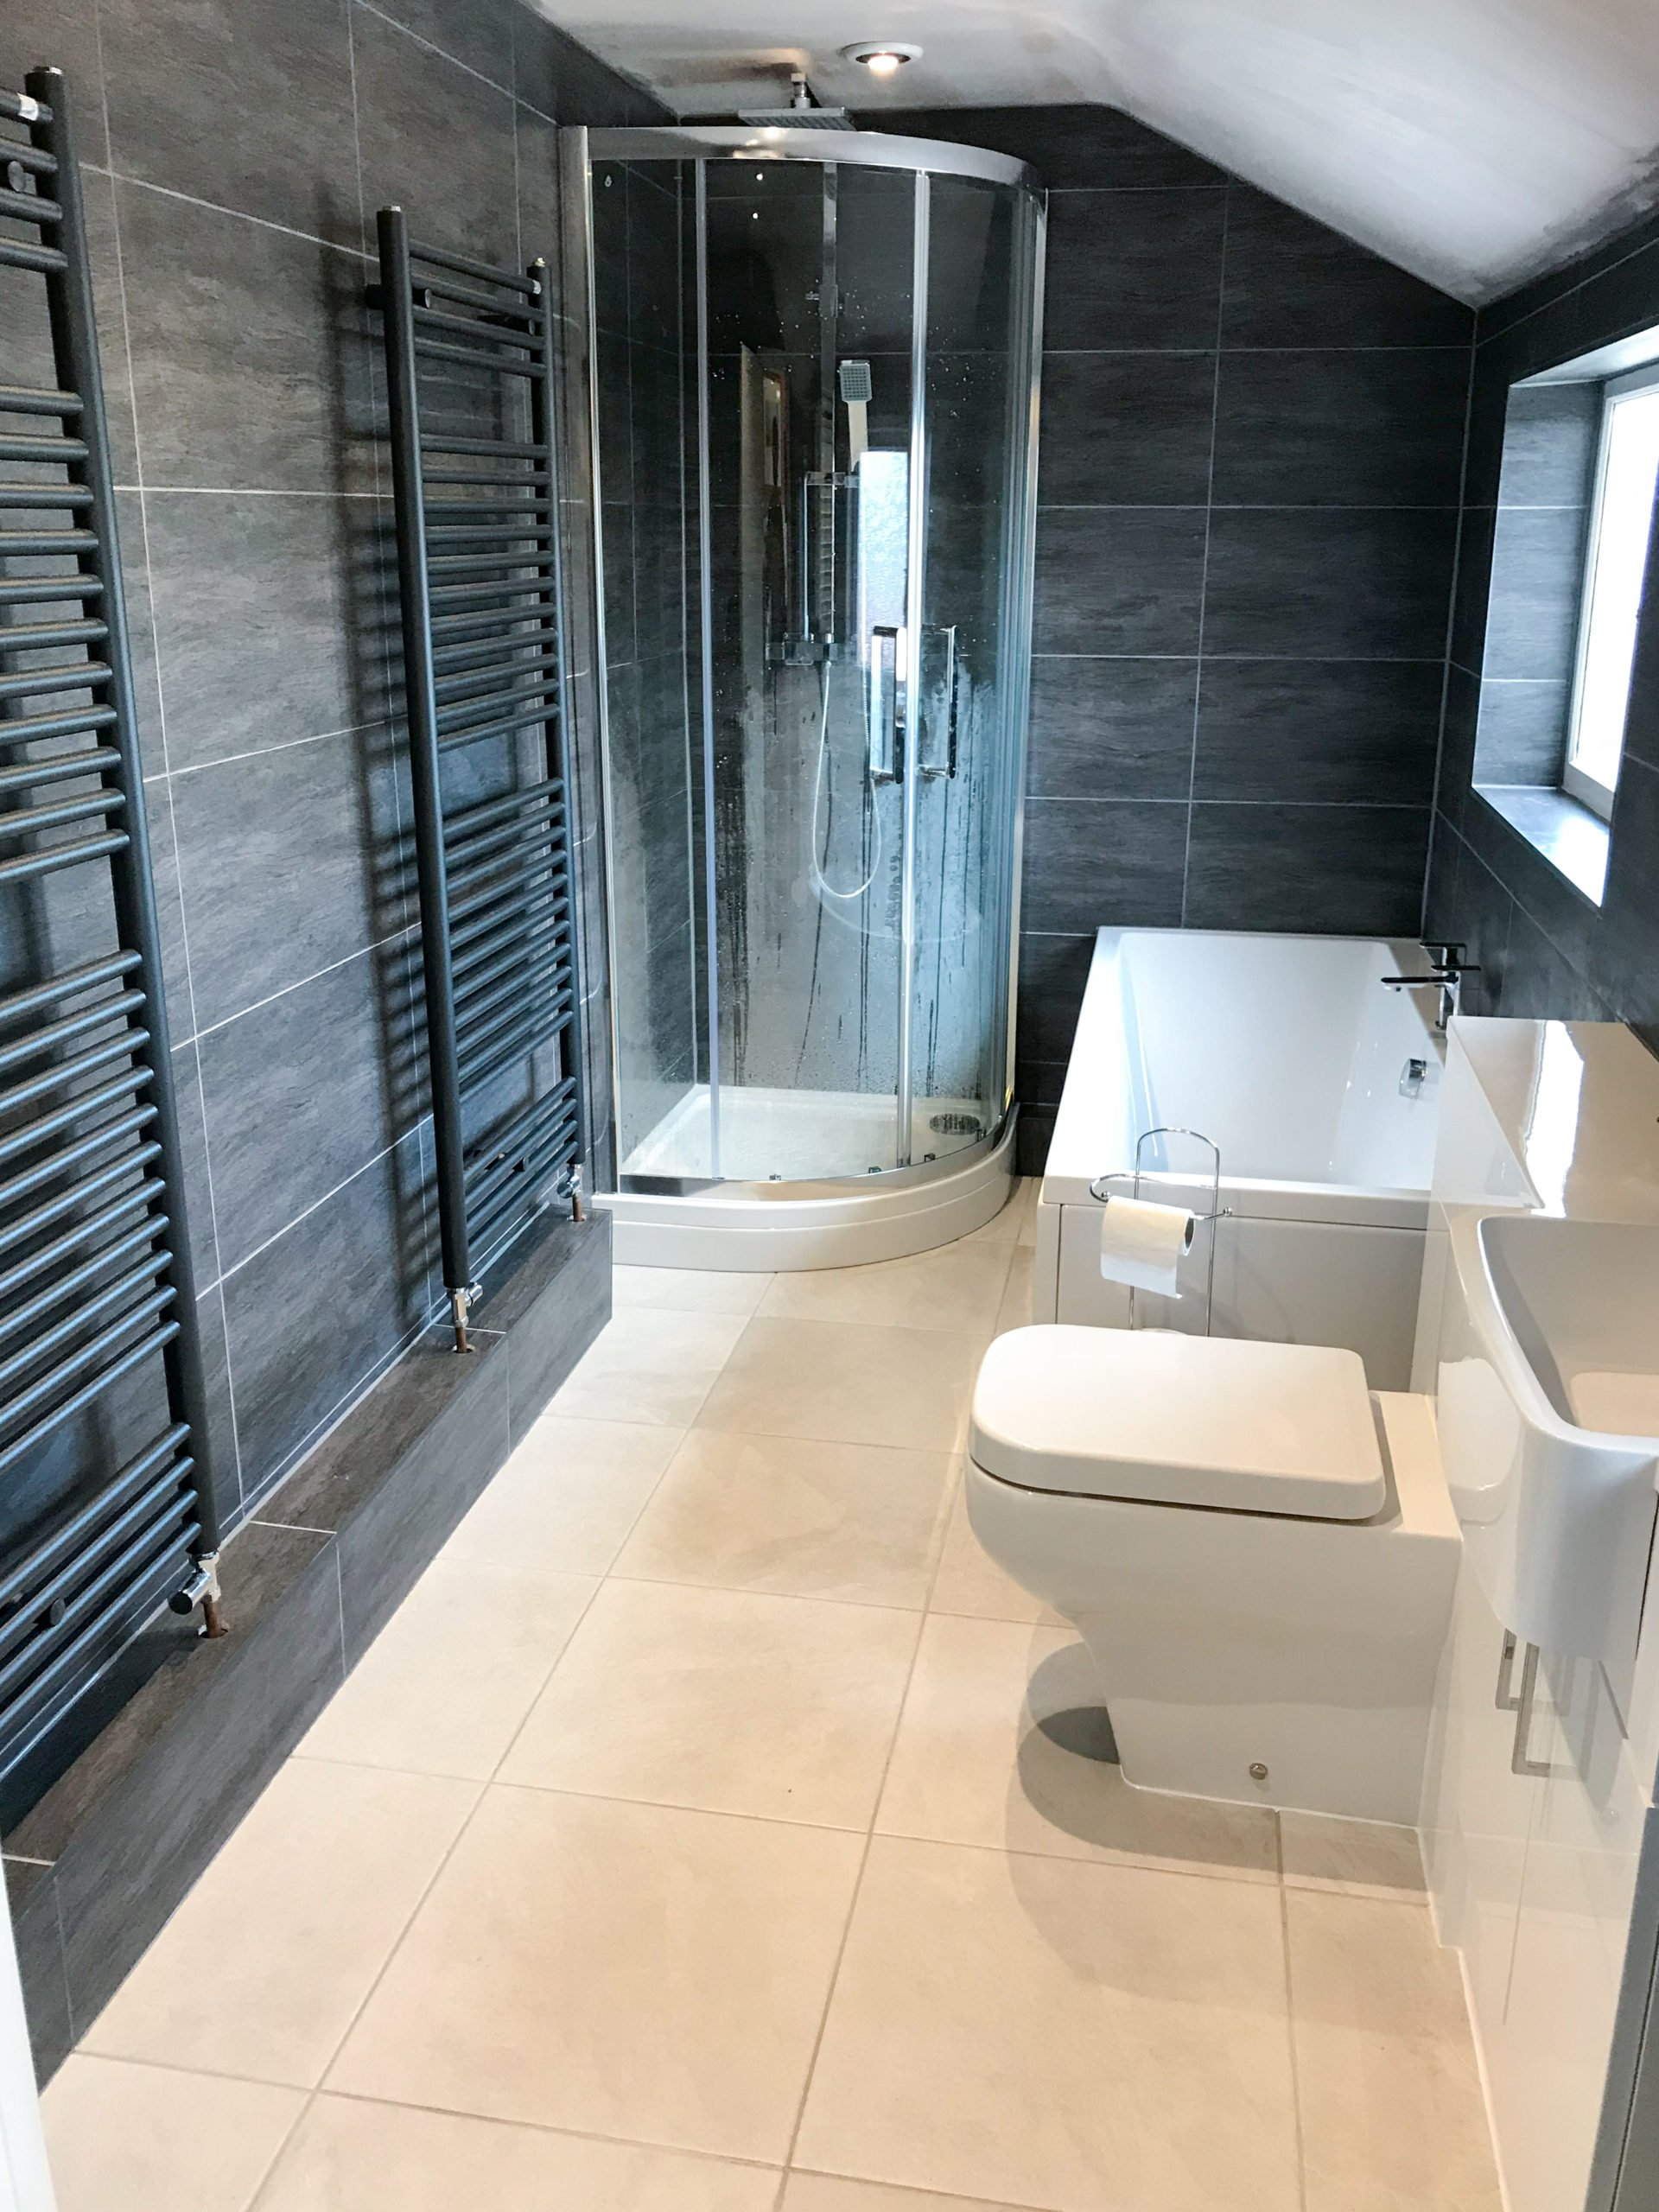 Angular Bathtub and Toilet - Modern Bathroom